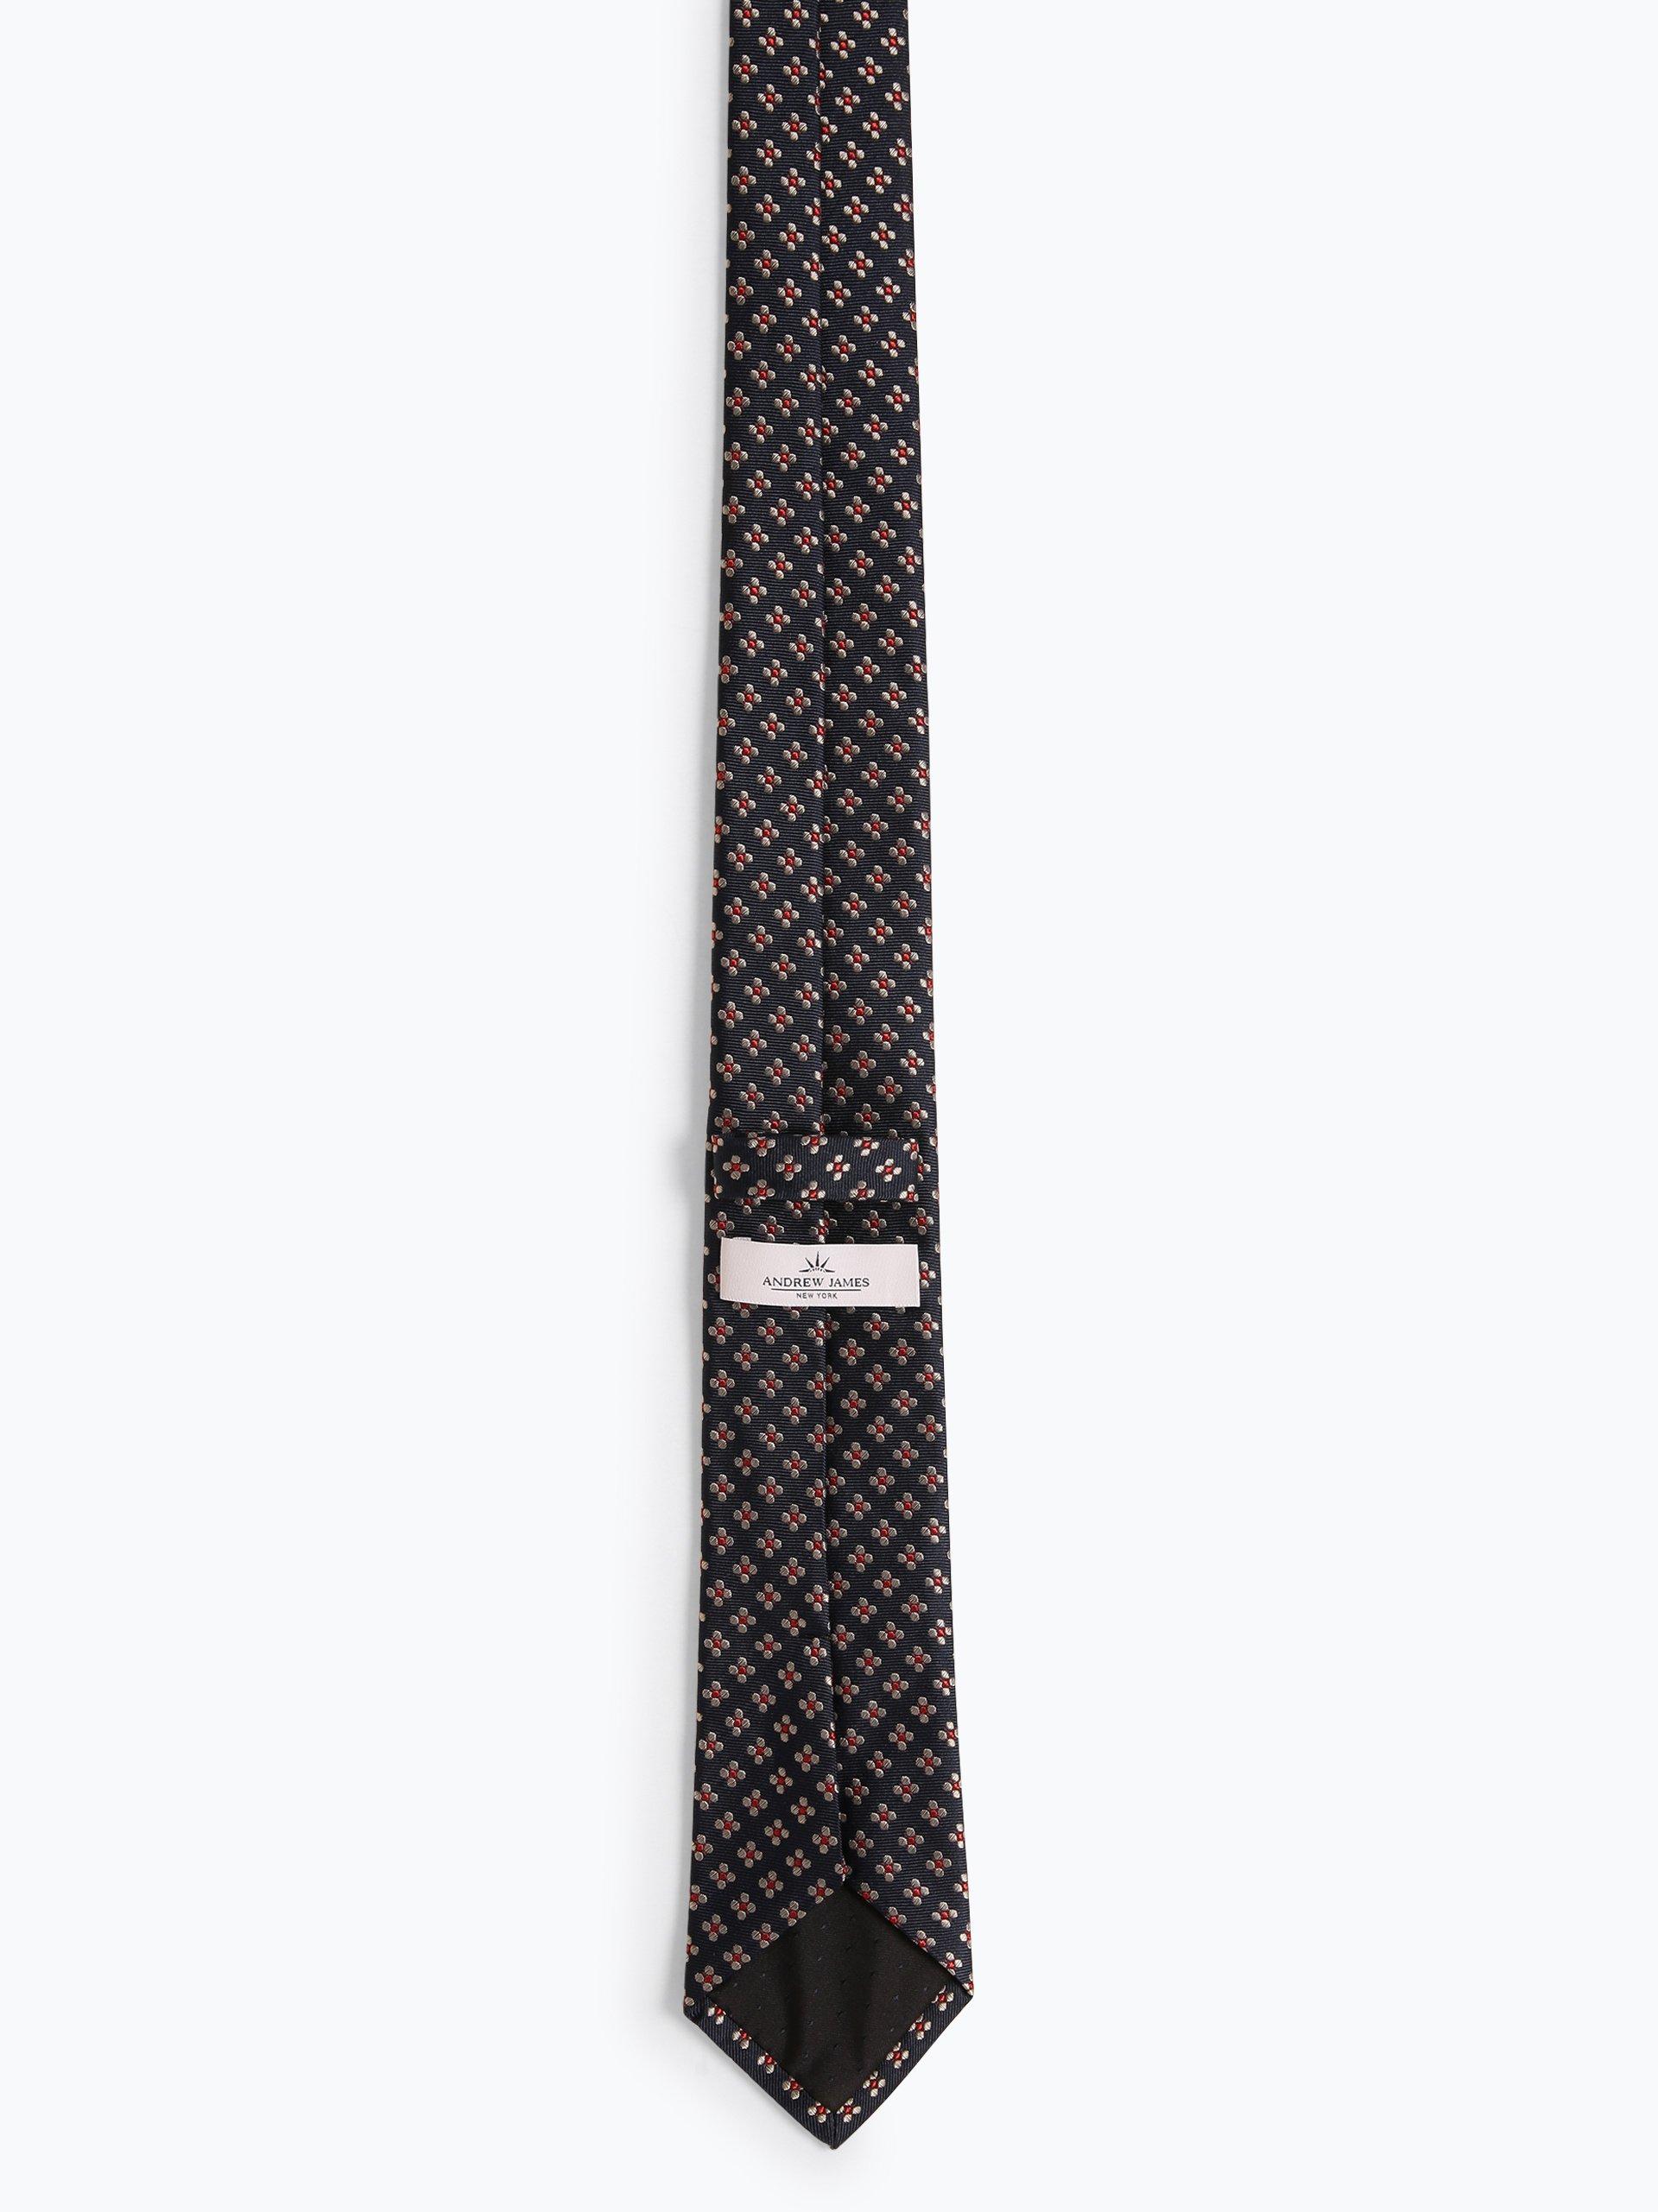 Andrew James New York Herren Krawatte aus Seide